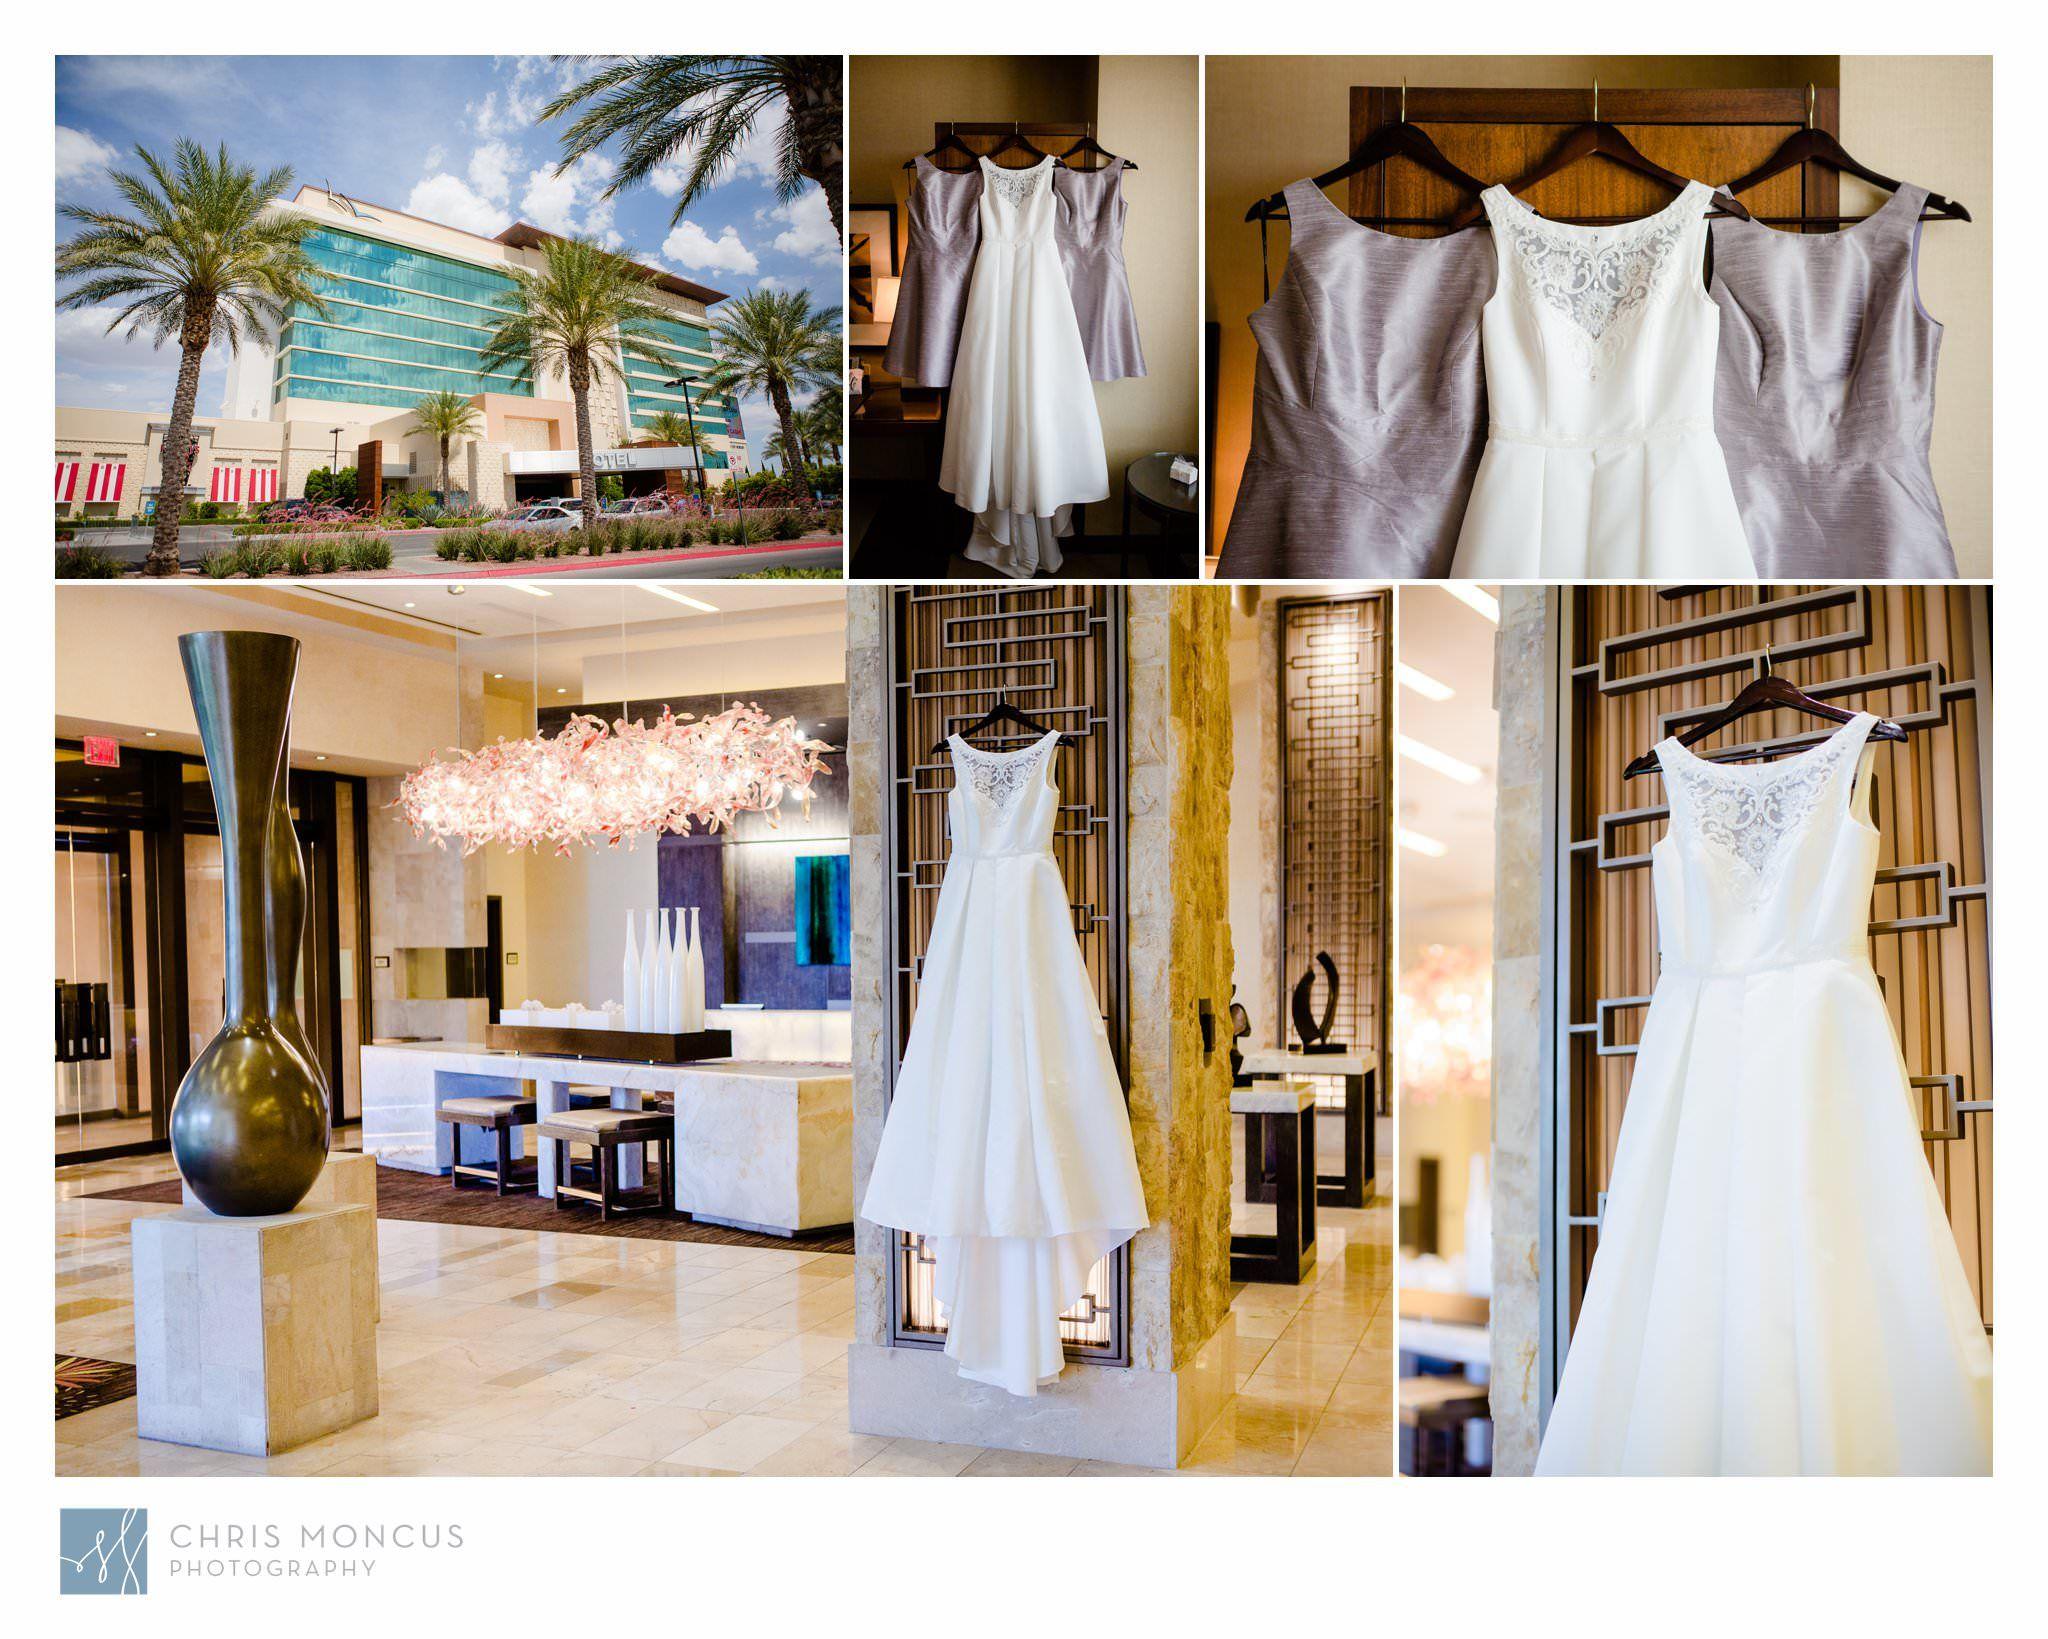 Wedding Dresses in Aliante Casino Lobby Las Vegas